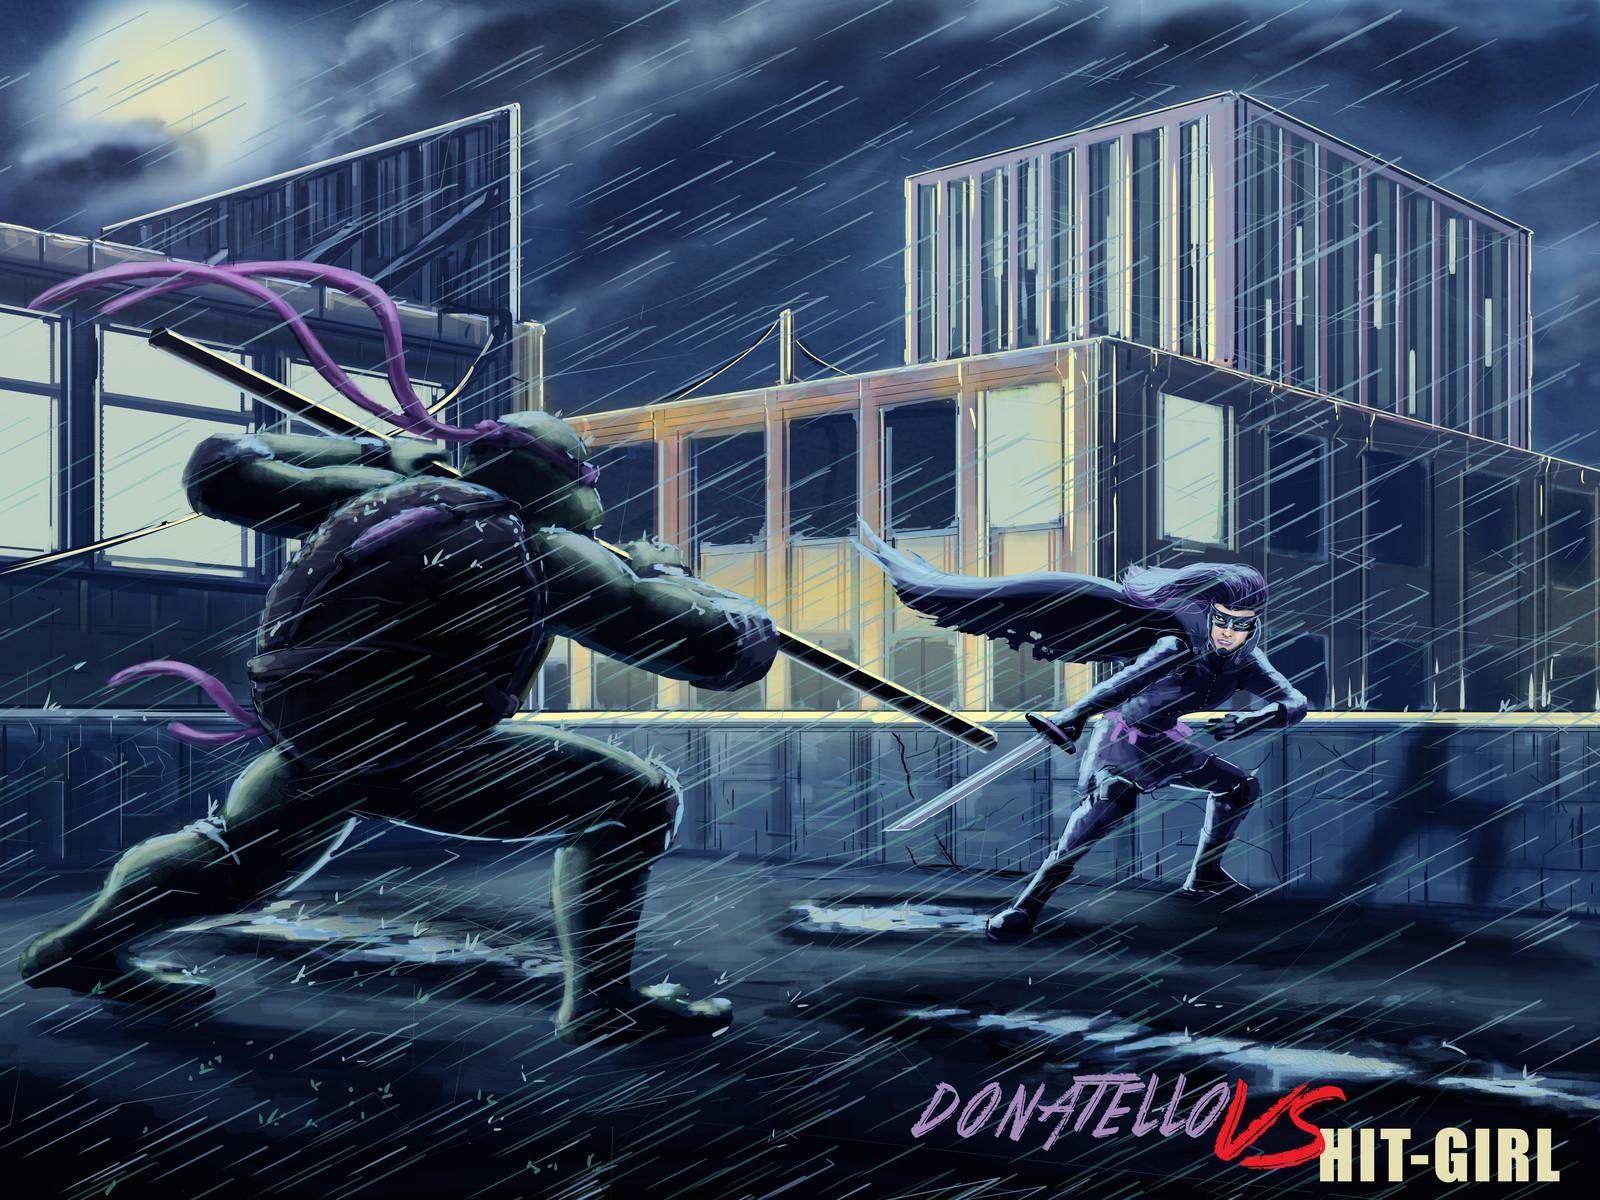 Donatello vs Hit Girl